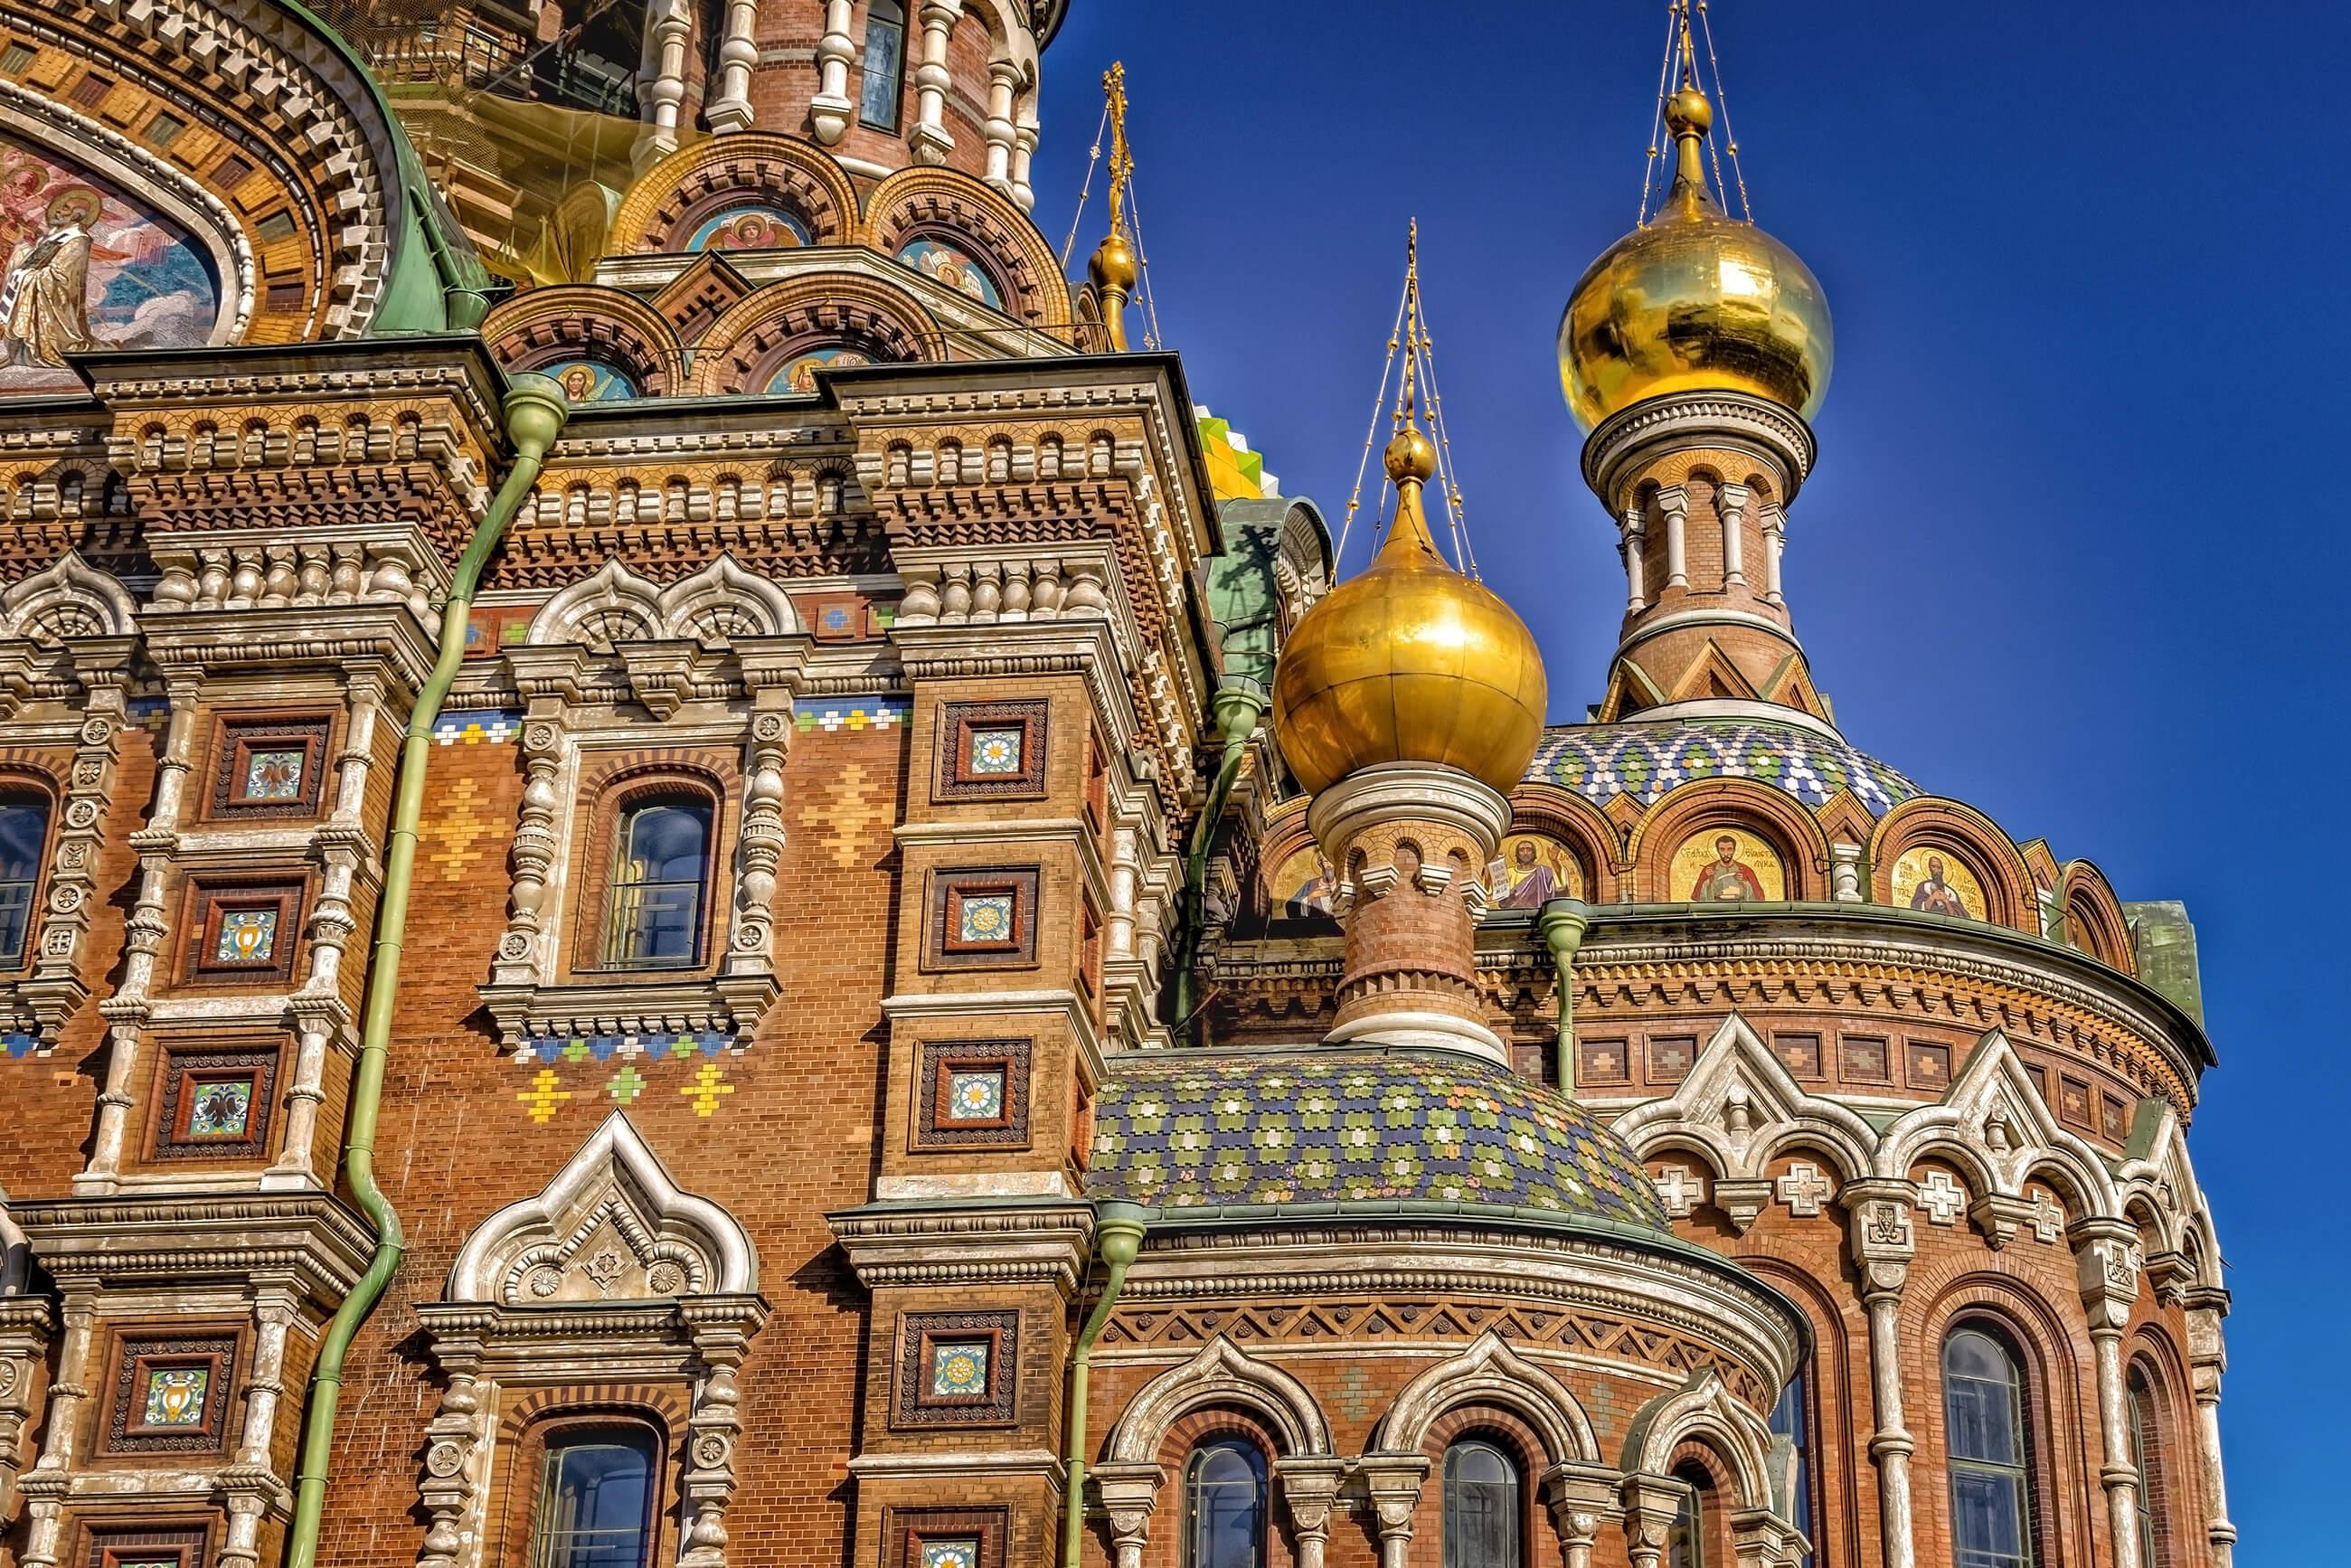 https://bubo.sk/uploads/galleries/5055/rusko_petrohrad_church-3731018.jpg